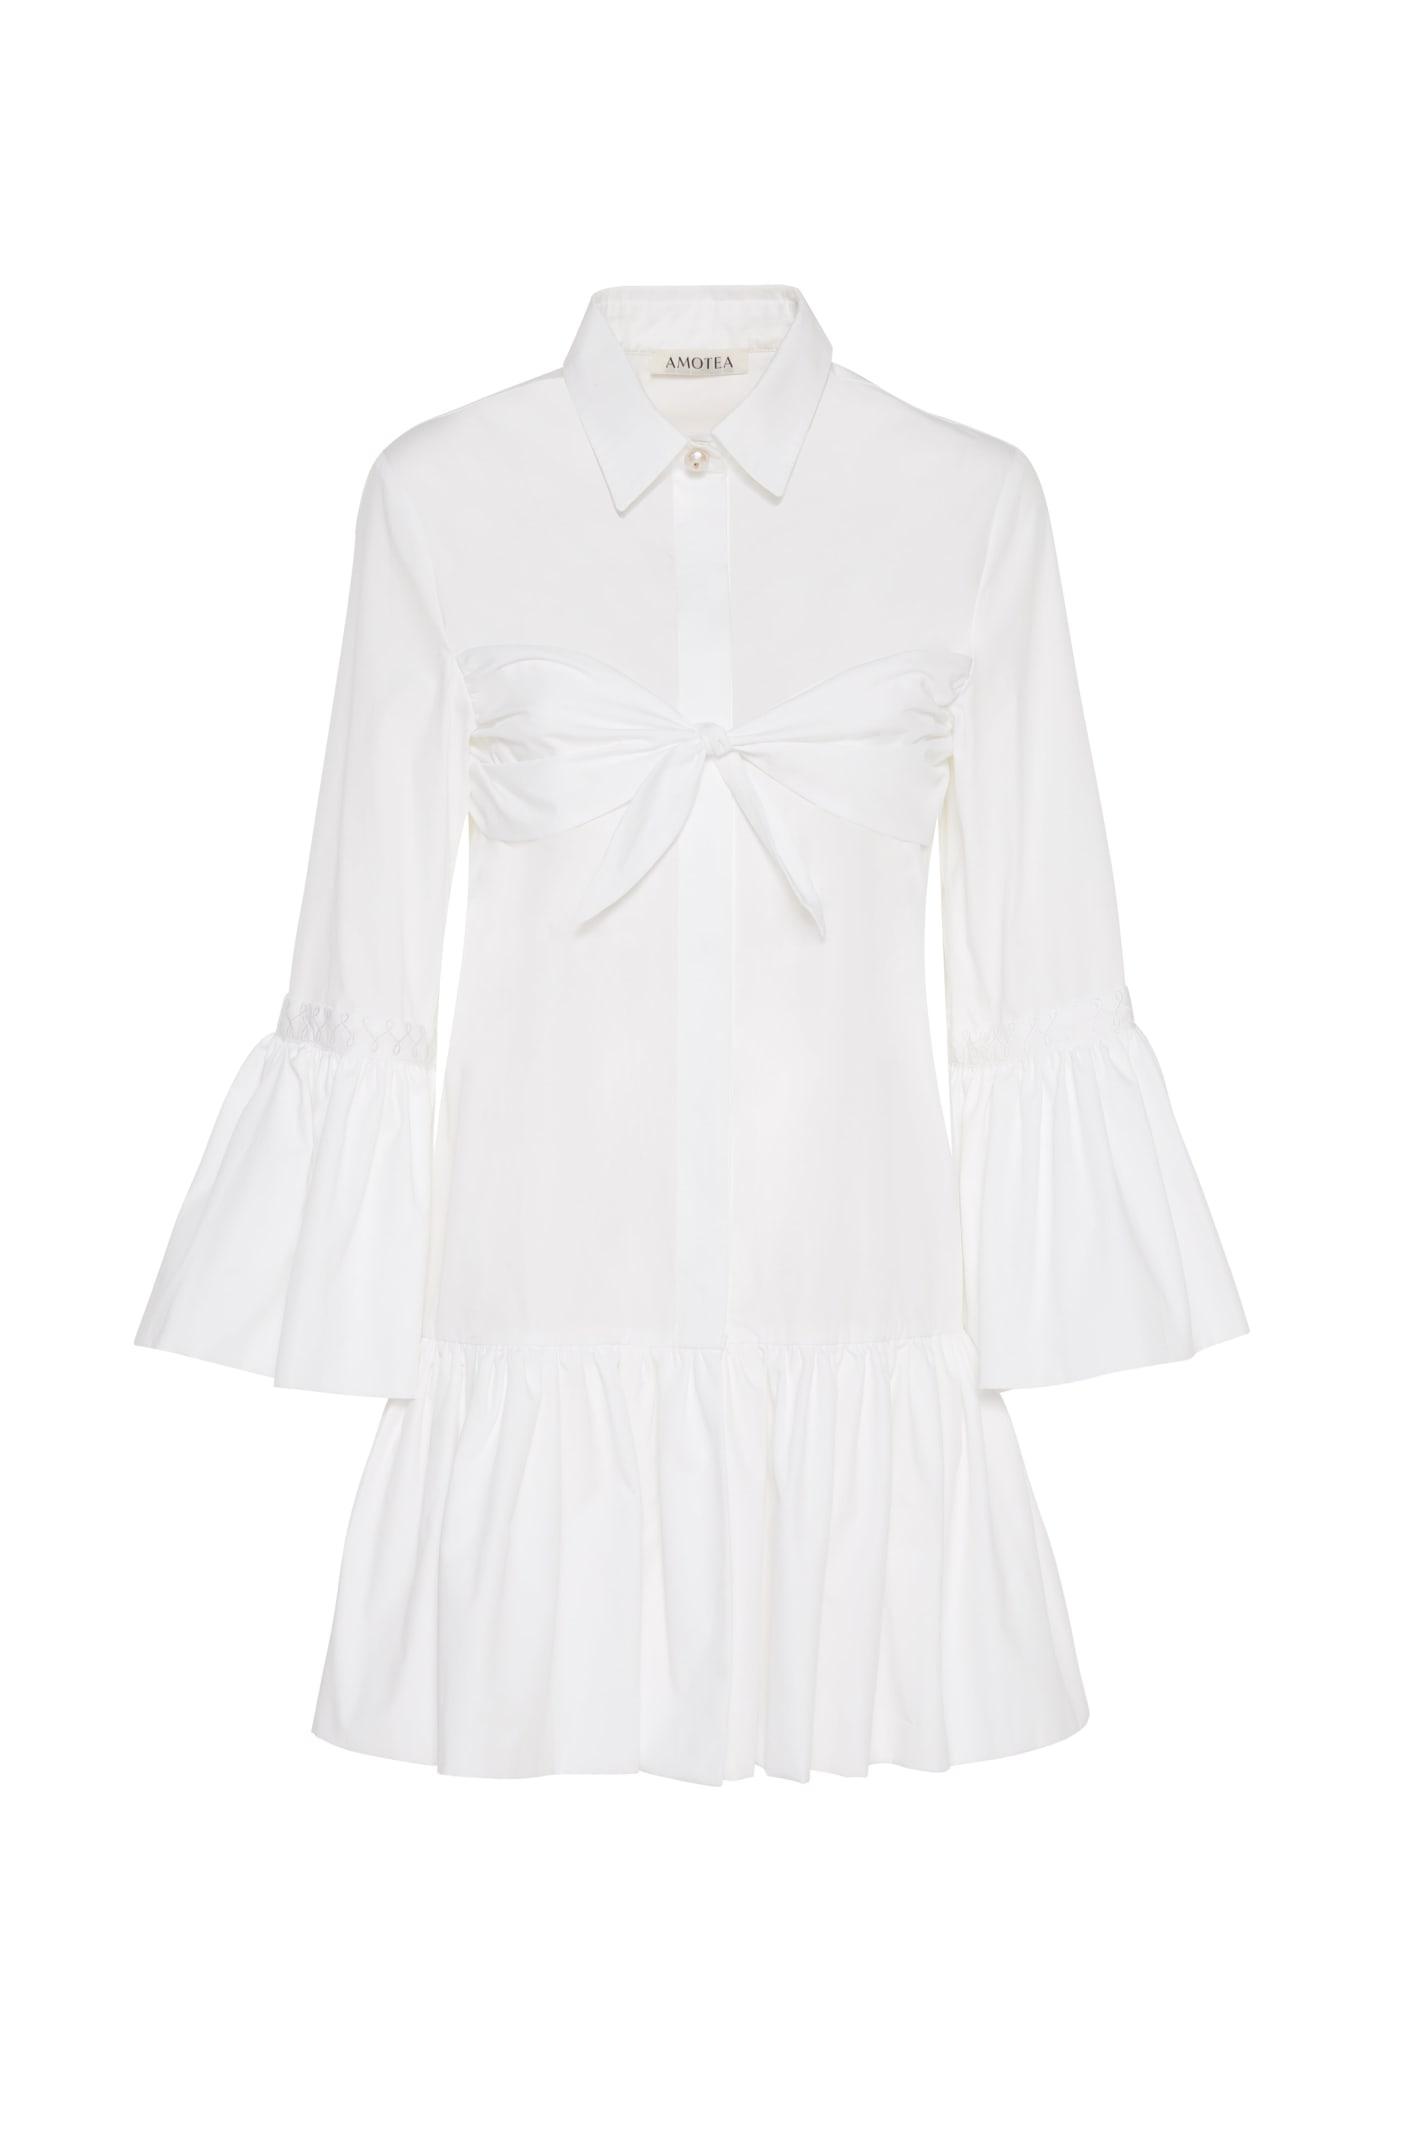 Buy Amotea Nina Mini Dress In White Poplin online, shop Amotea with free shipping